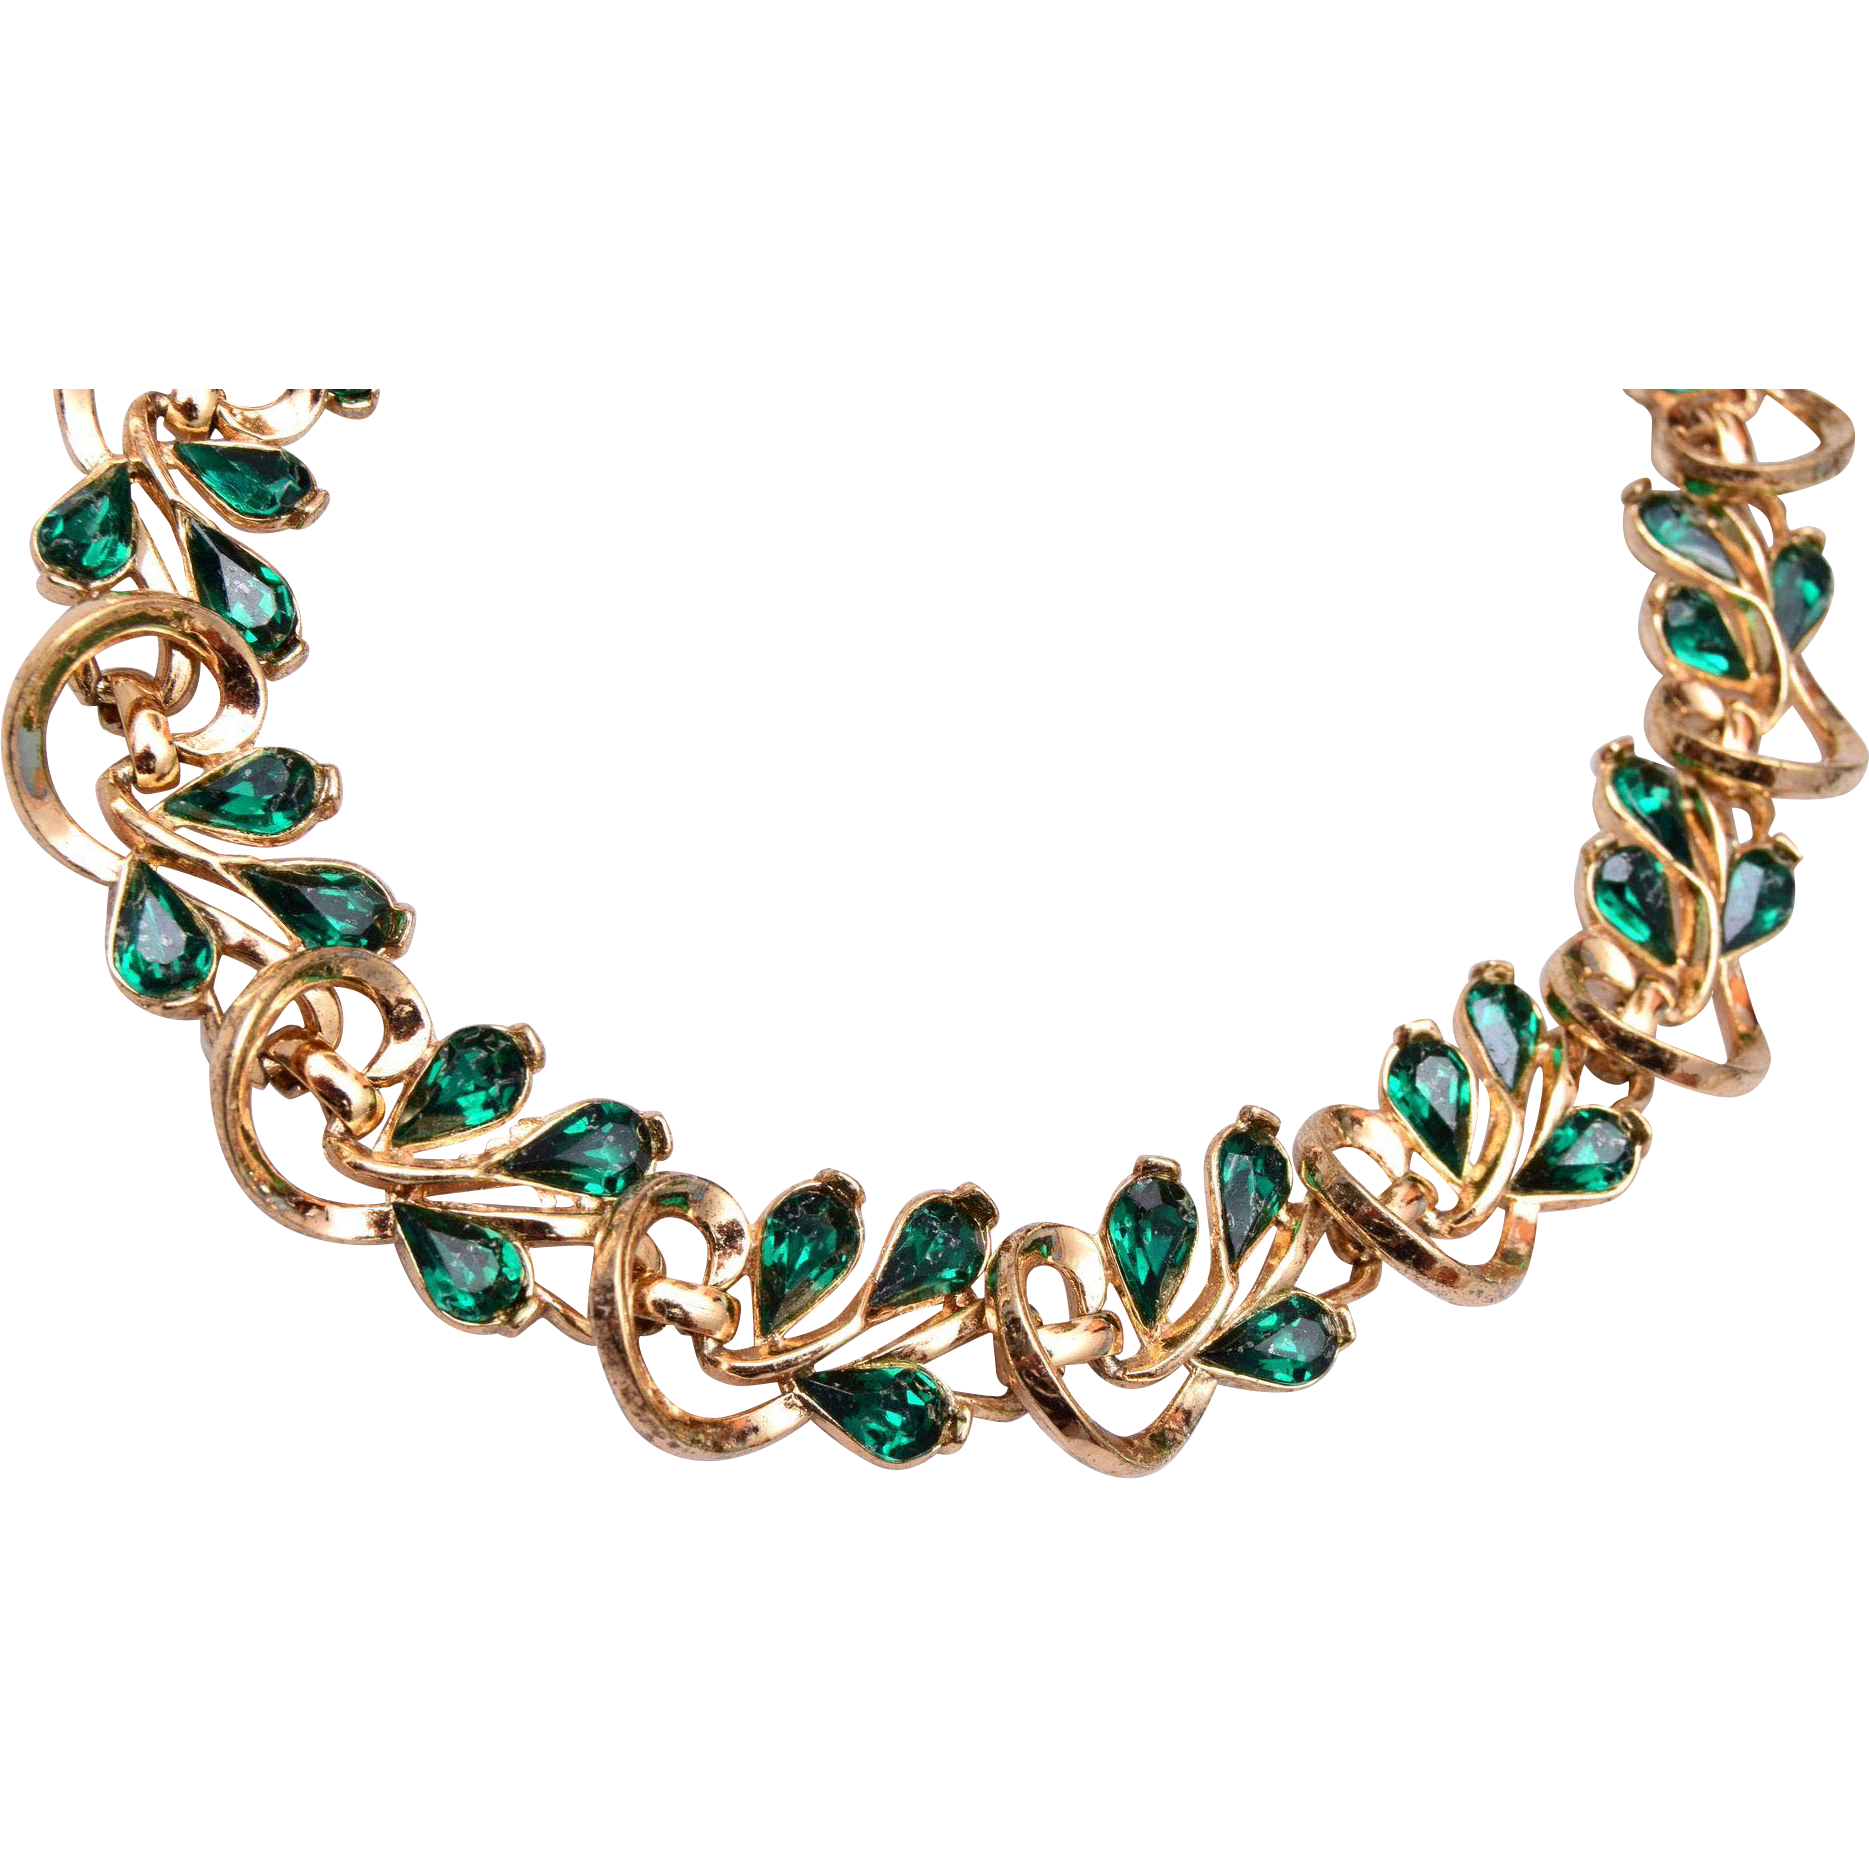 Trifari Green Rhinestone Necklace